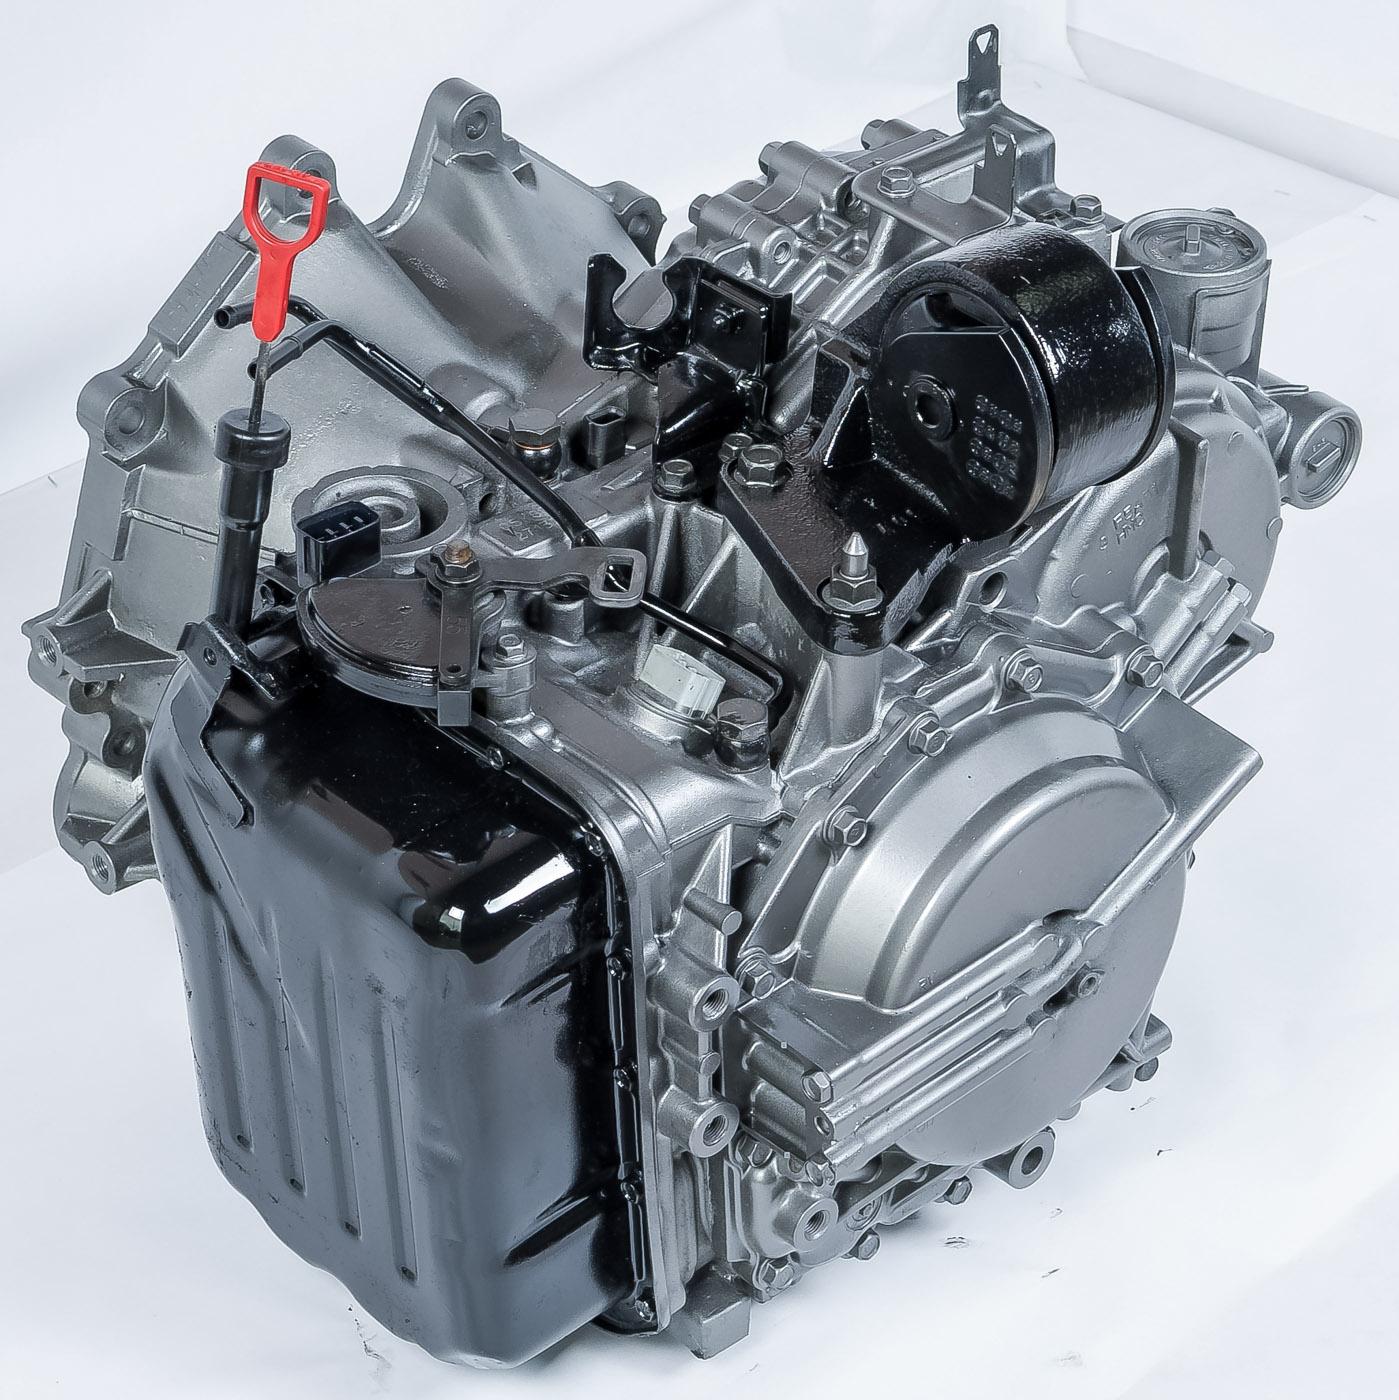 2003-2006 Hyundai Santa Fe 3.5L V6 Used 2WD Automatic Transmission